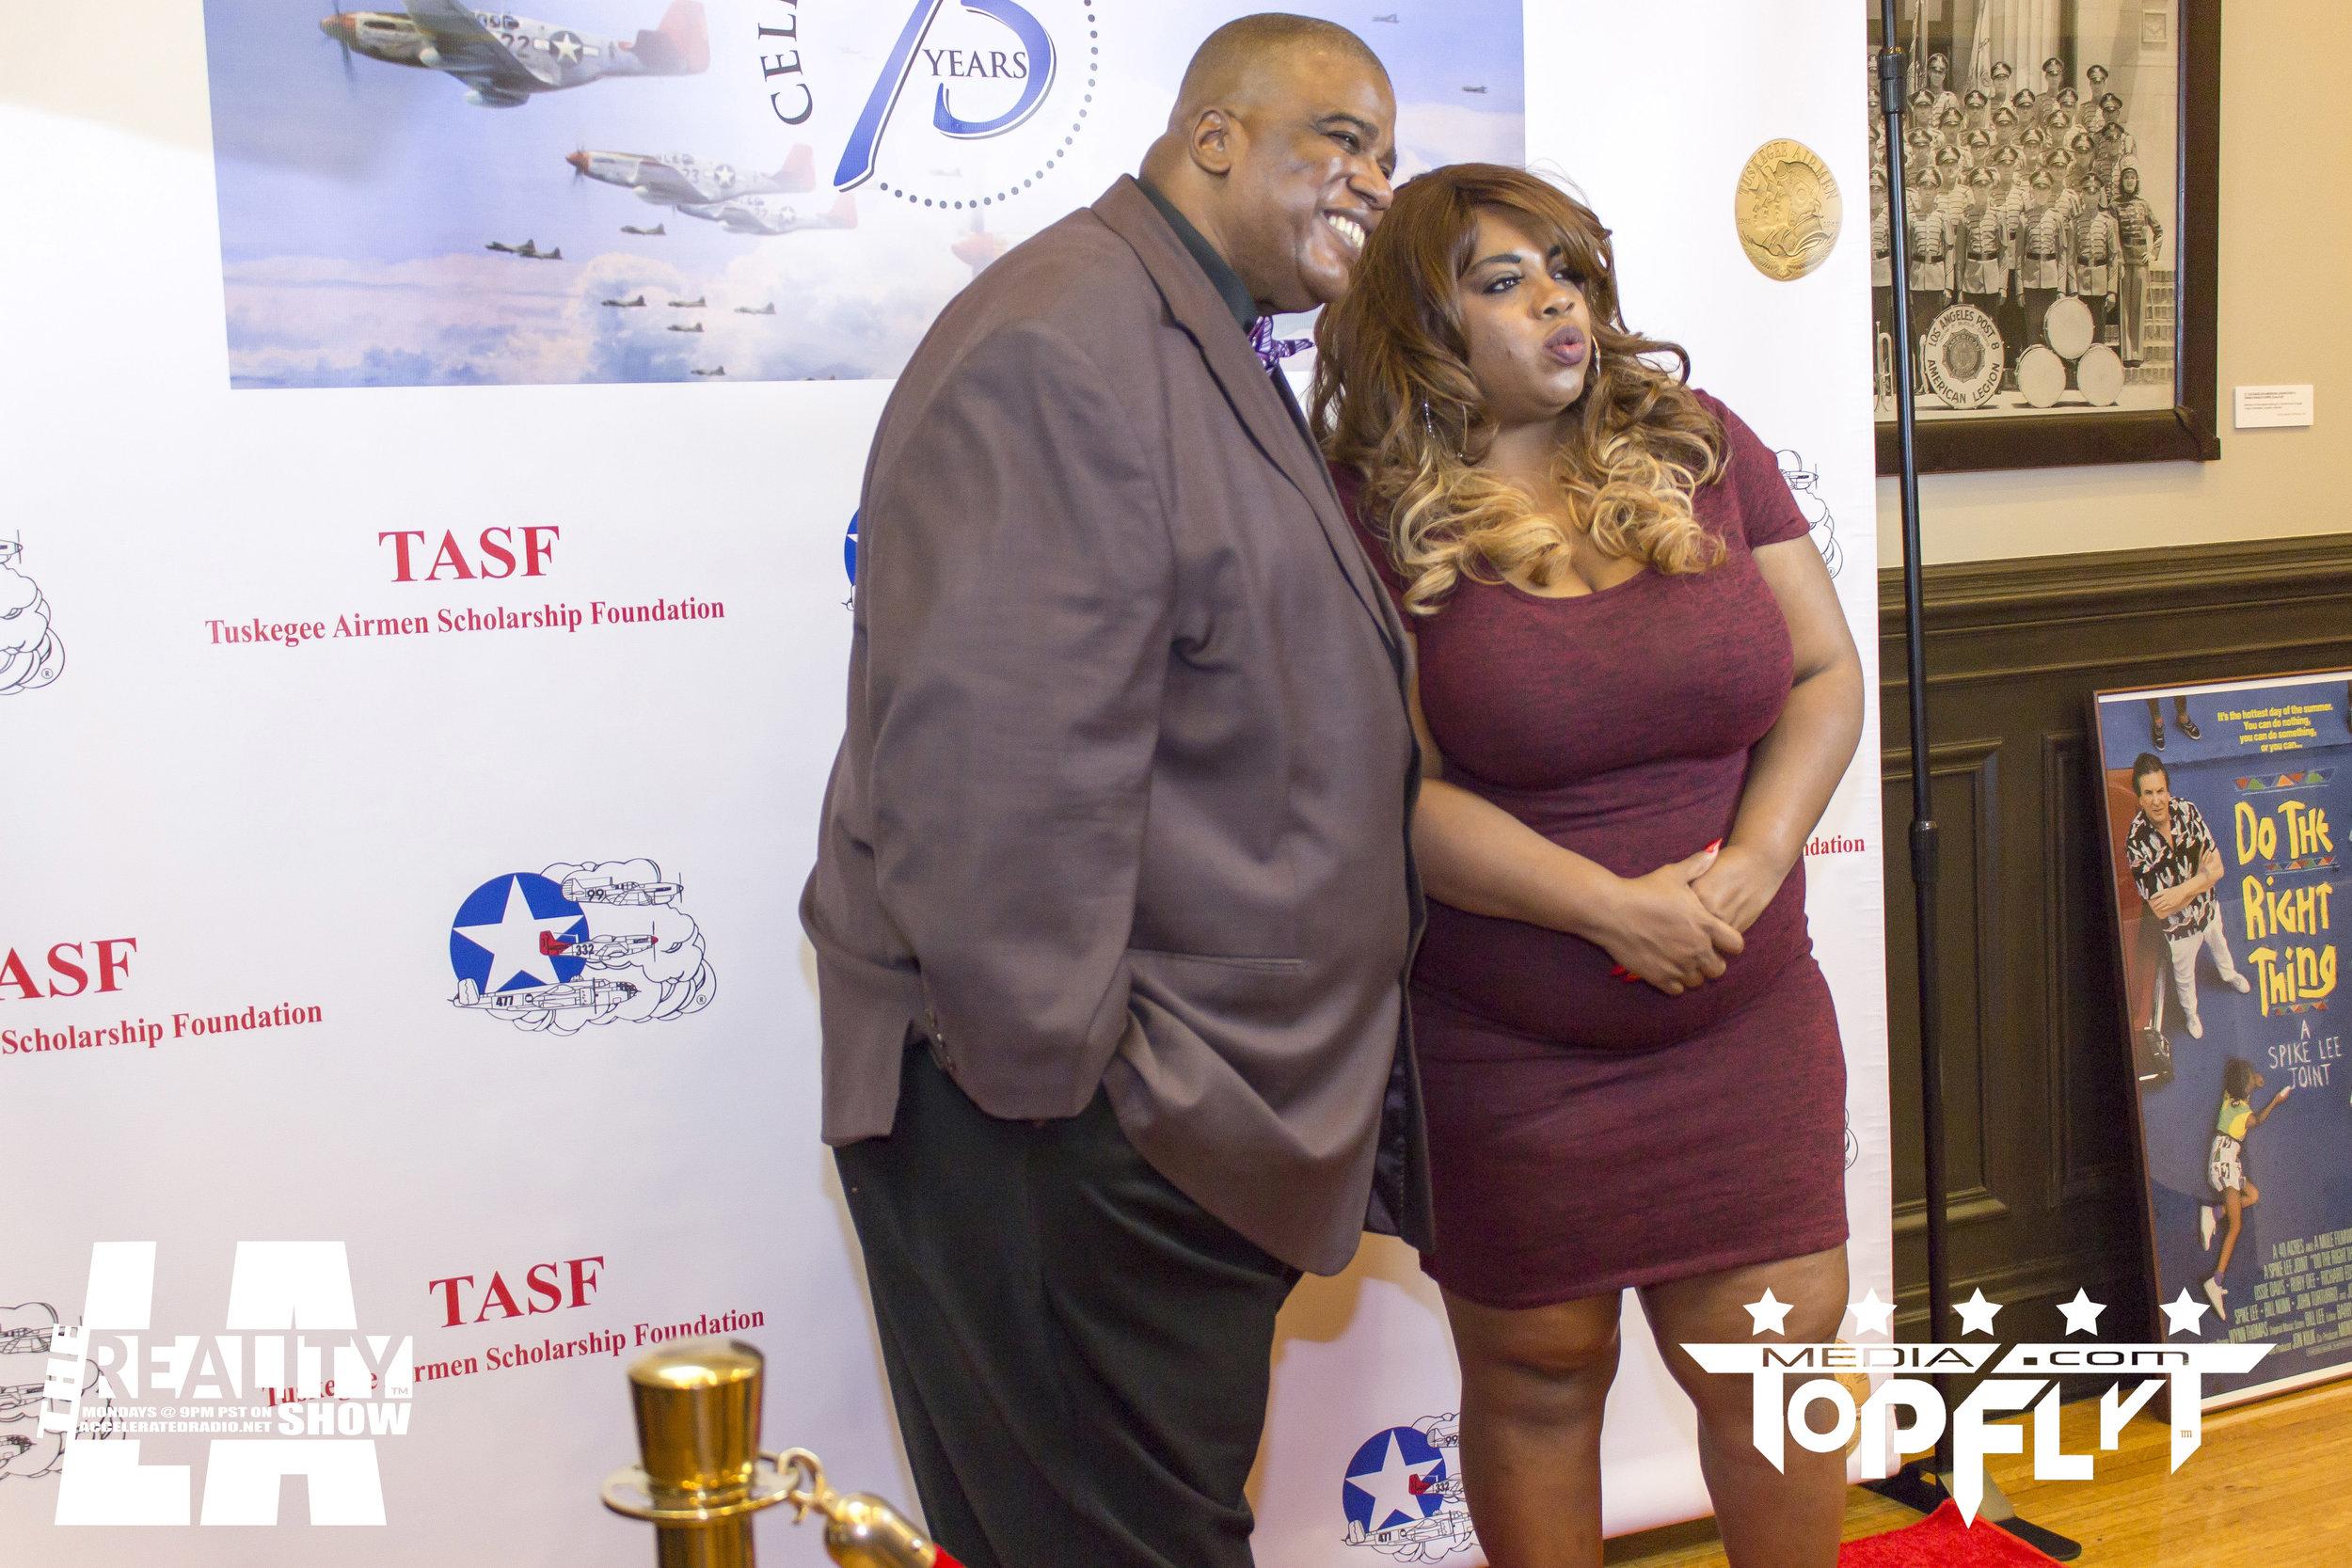 The Reality Show LA - Tuskegee Airmen 75th Anniversary VIP Reception_53.jpg